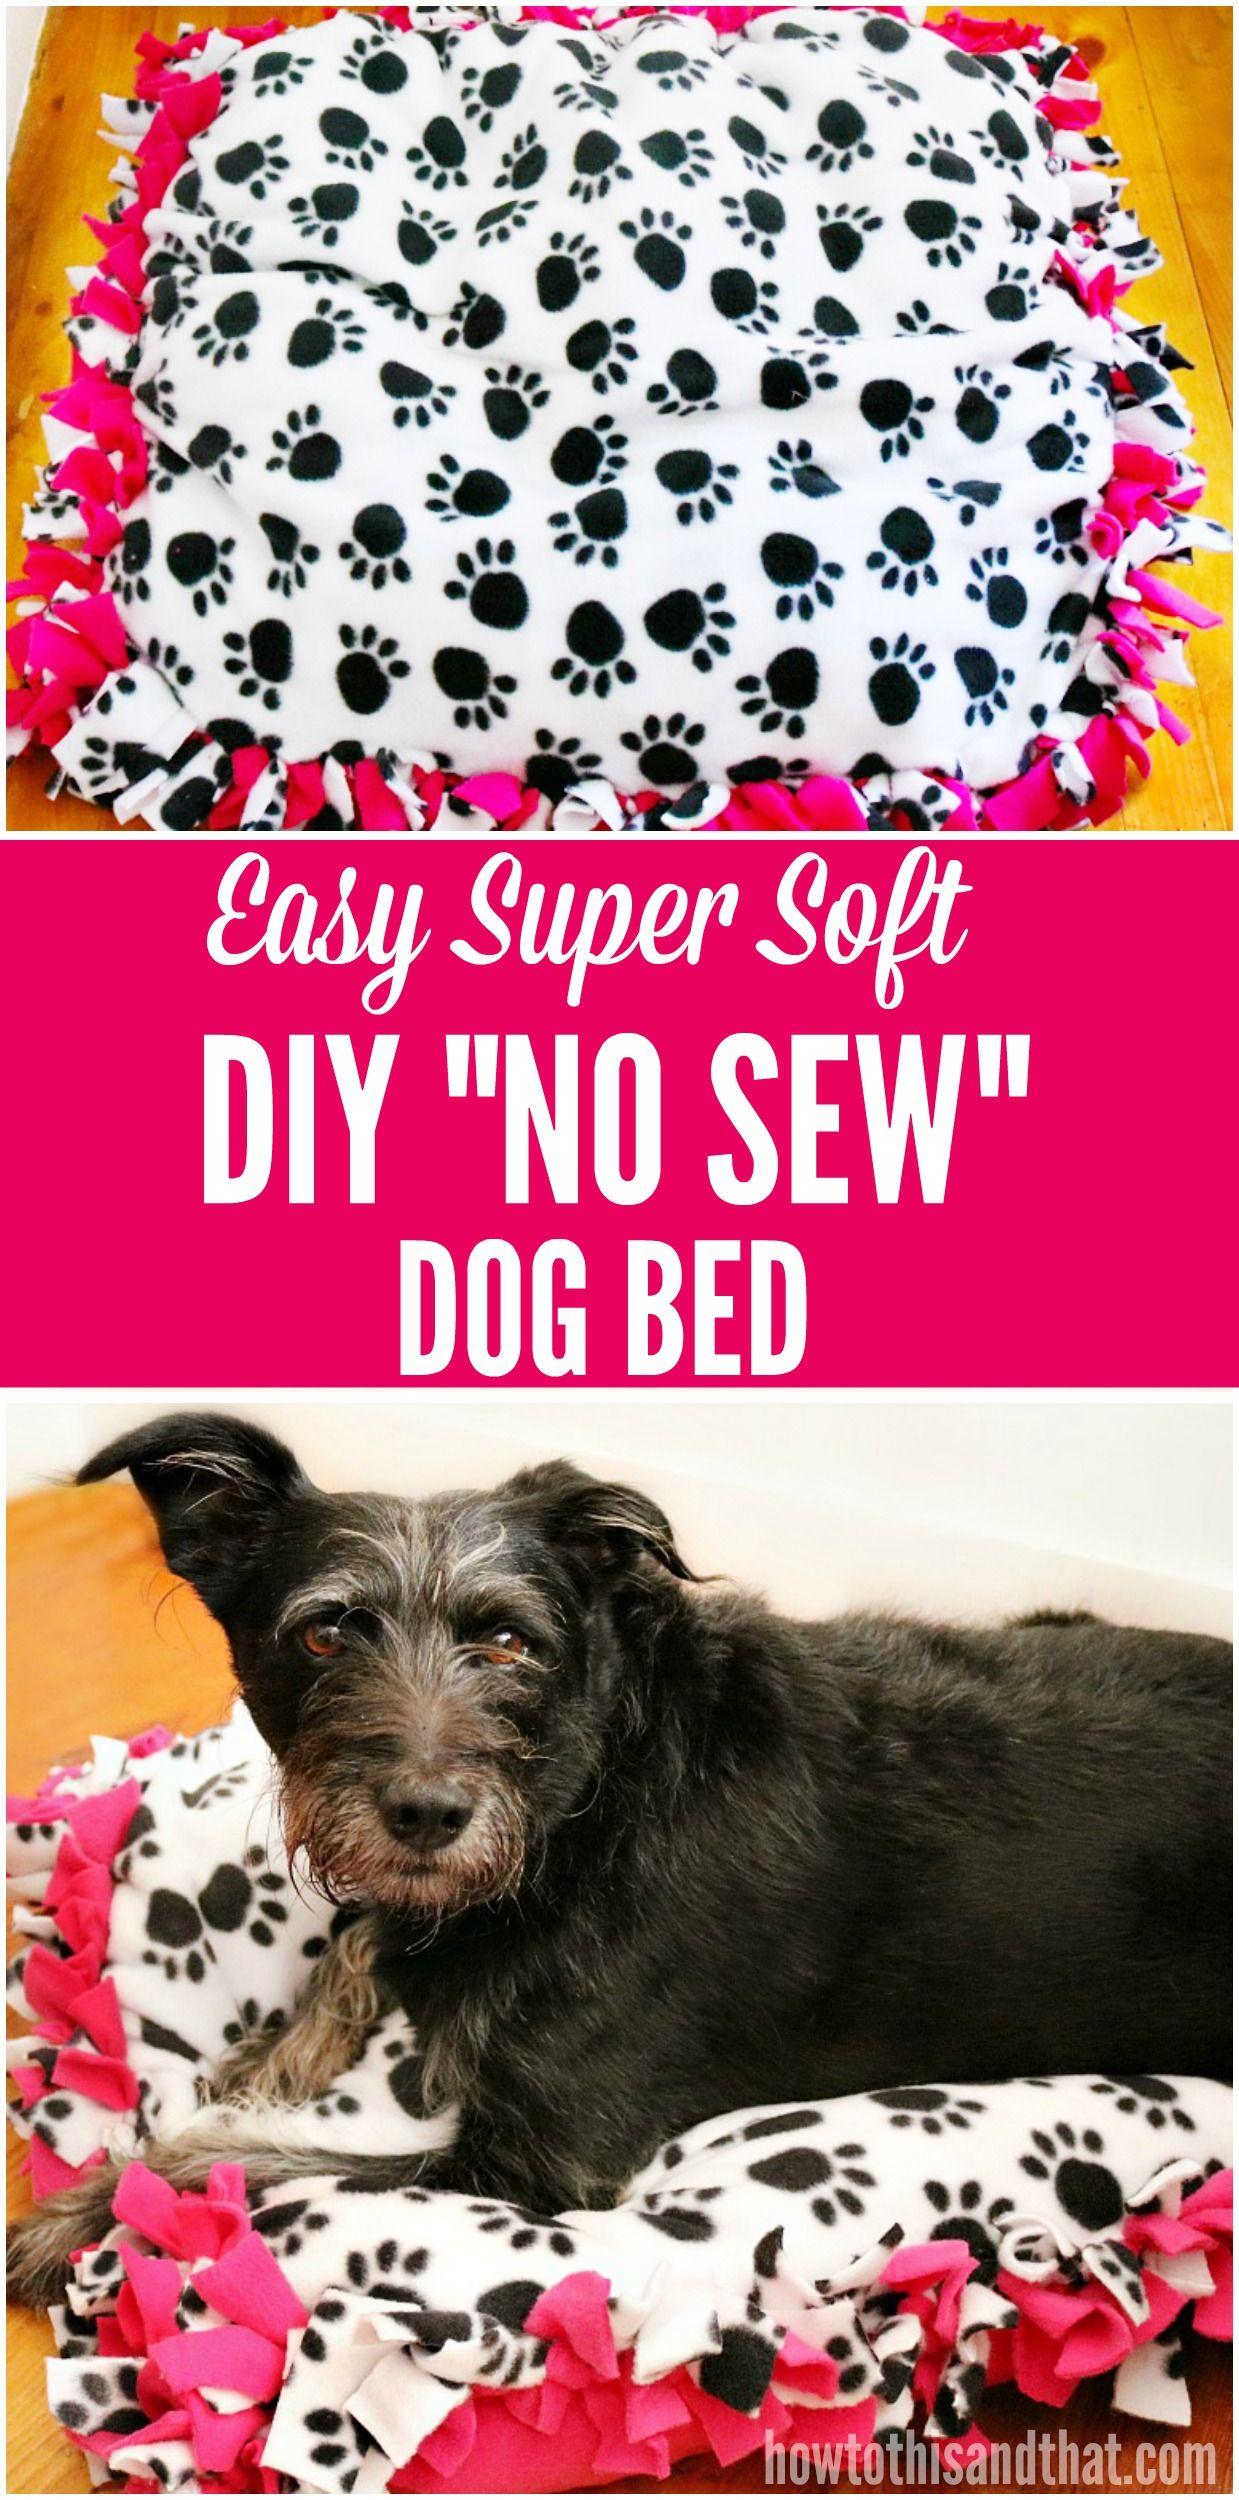 Diy No Sew Dog Bed Tutorial Featuring Newbeneful Diy Pet